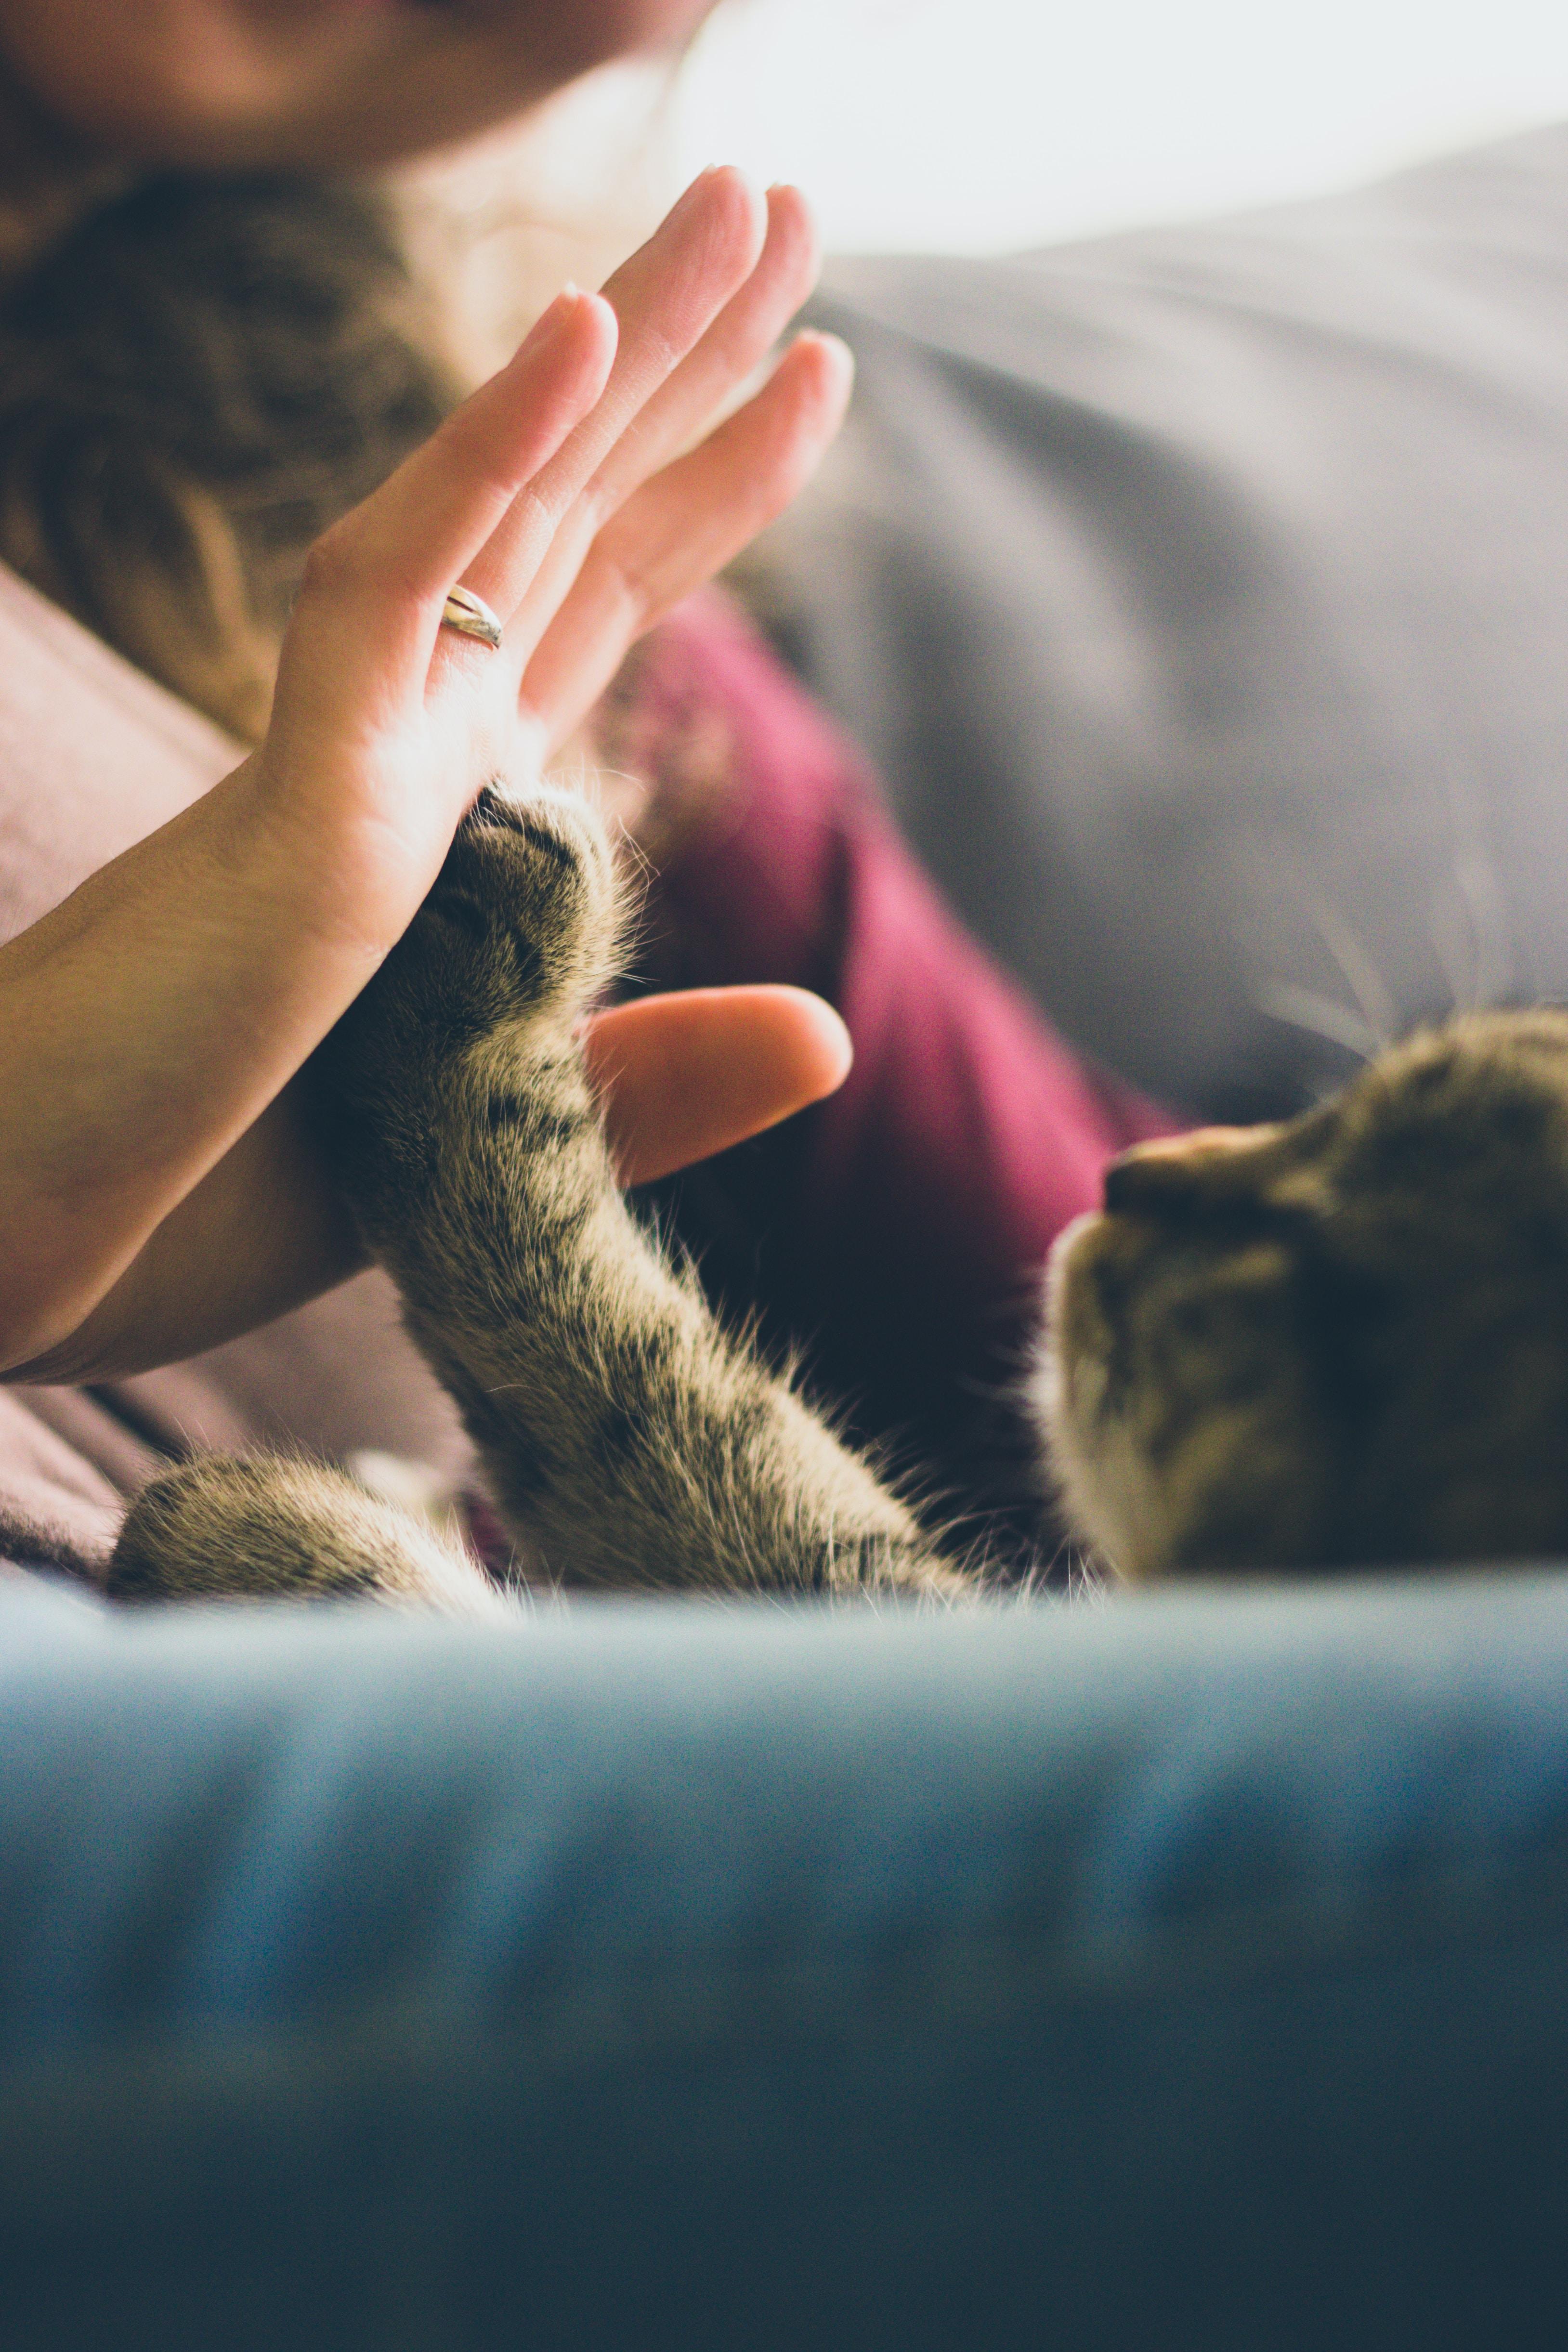 Pets cute stories